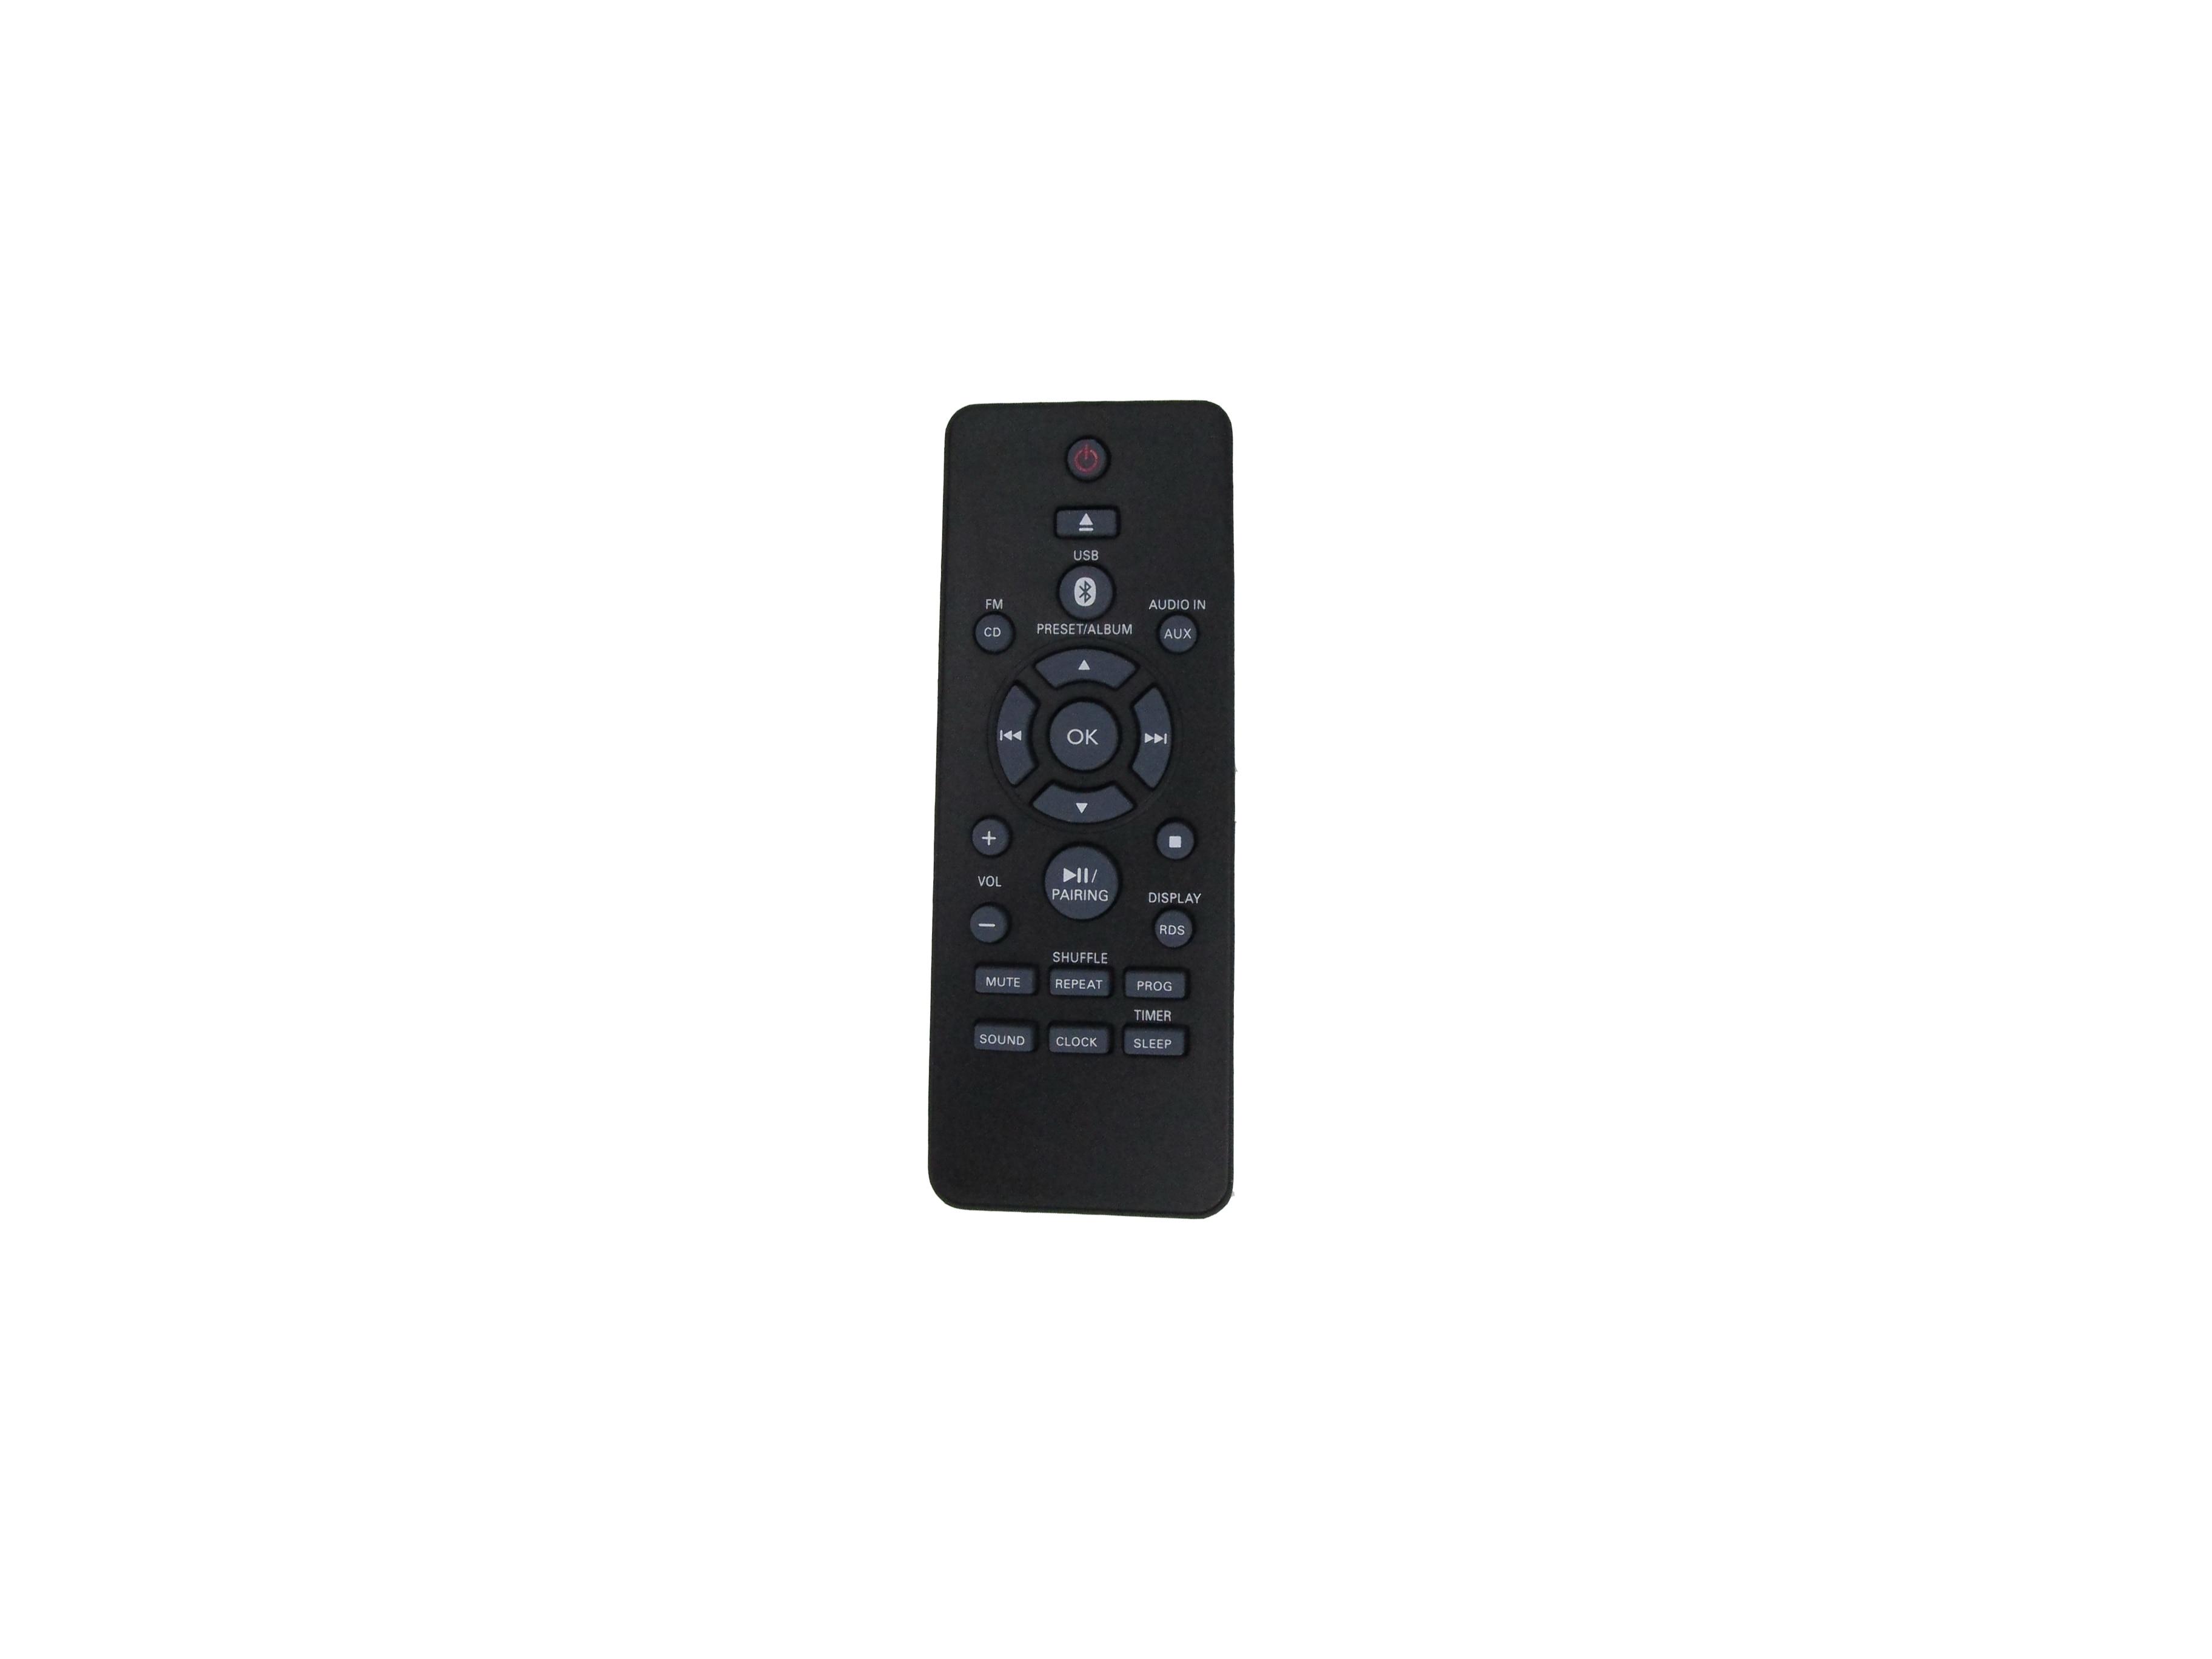 Control remoto para Philips BTM5120 BTM5120/12 DTM3170 DTM3170/02 DTM3170/12 996510063524 sistema de Audio de Micro música